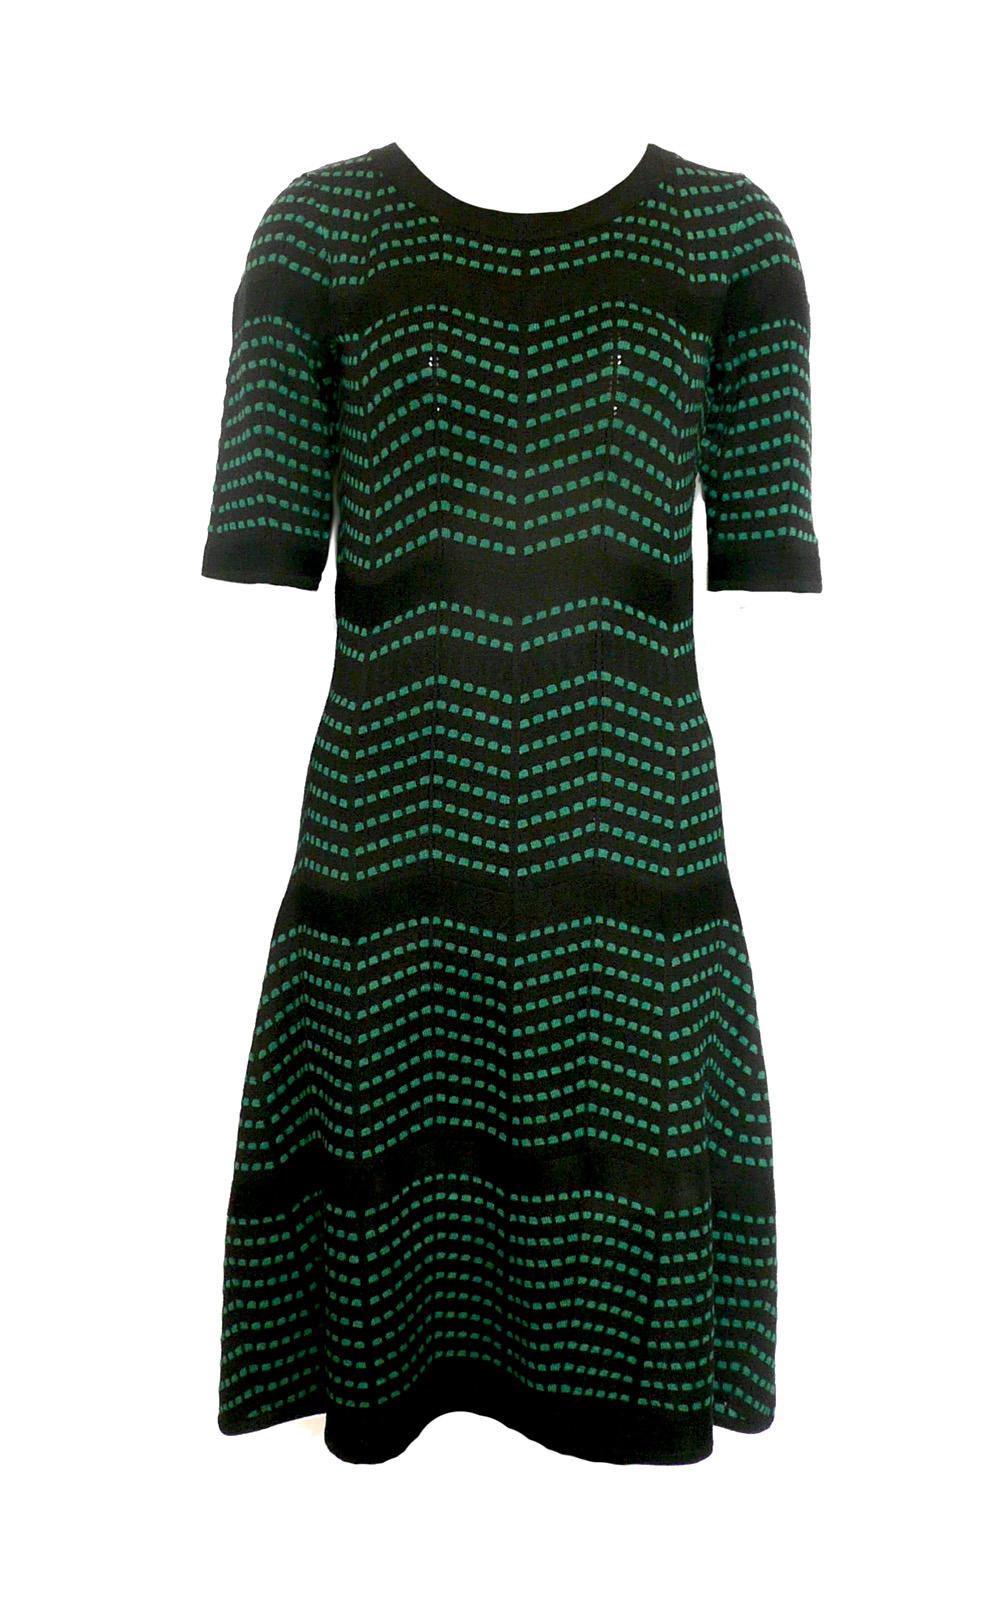 dress grn knit chevron.jpg